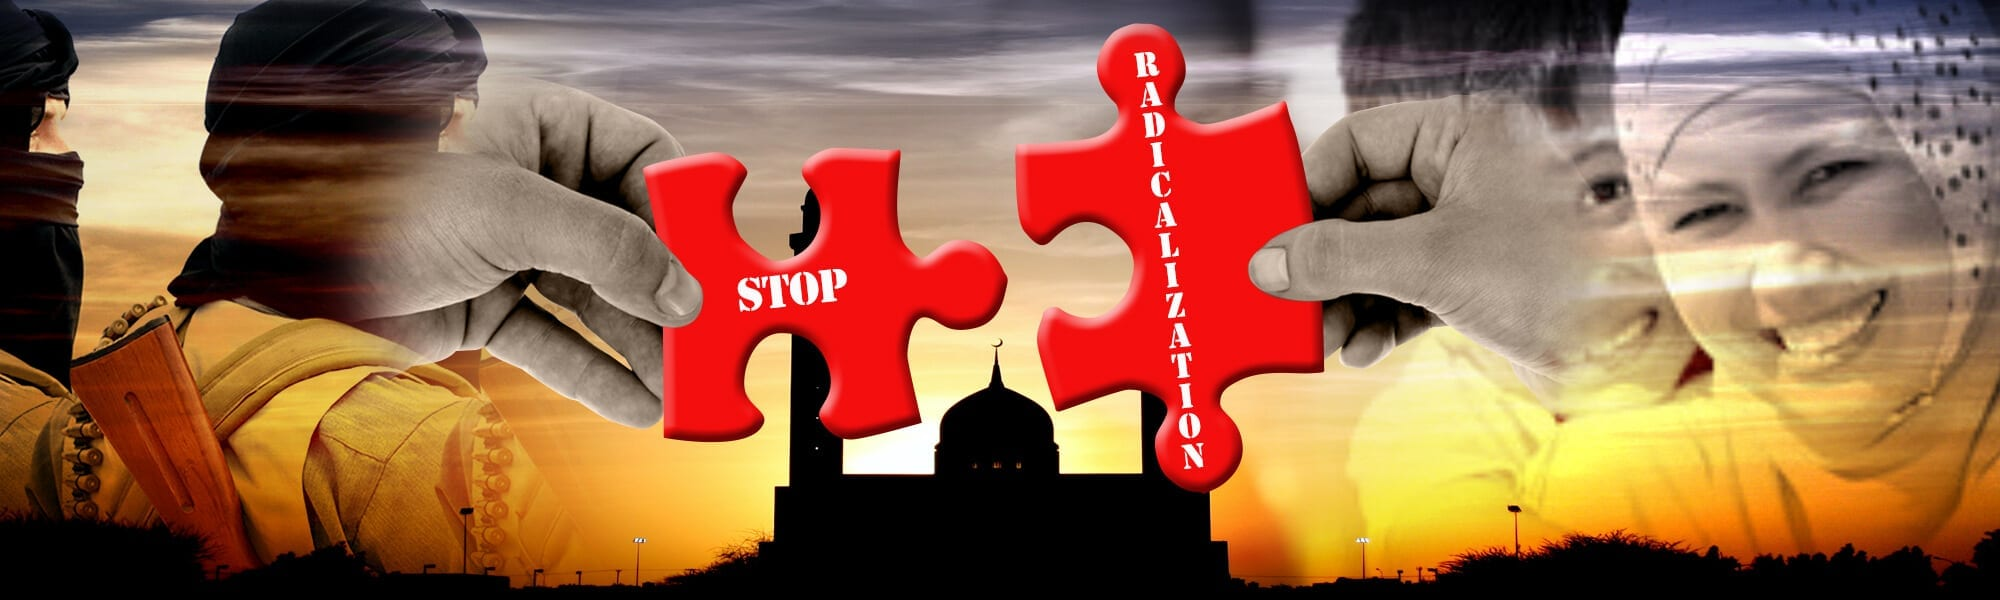 stop radicalization banner